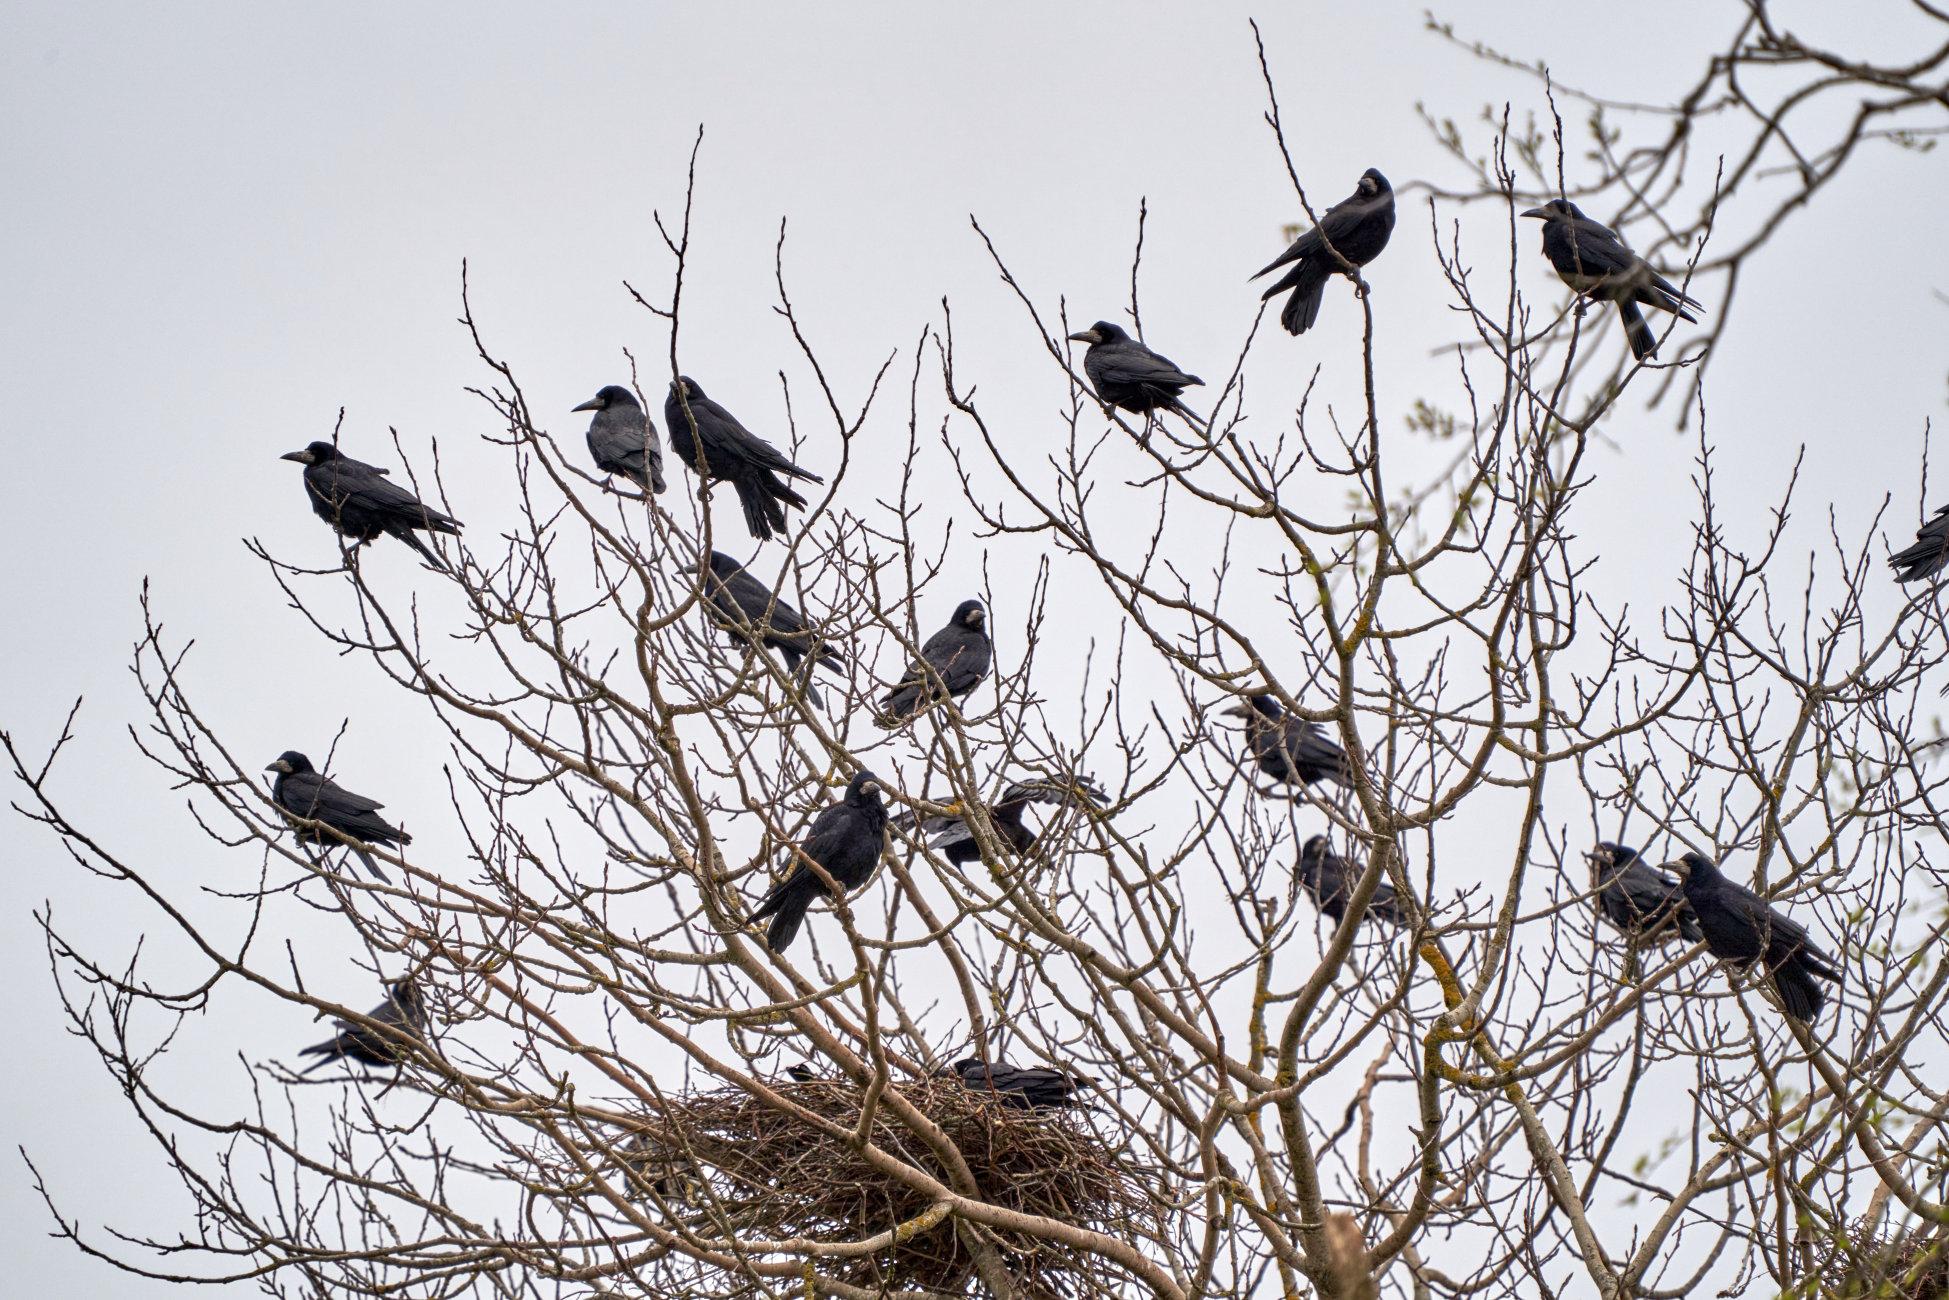 Flock of Rook birds